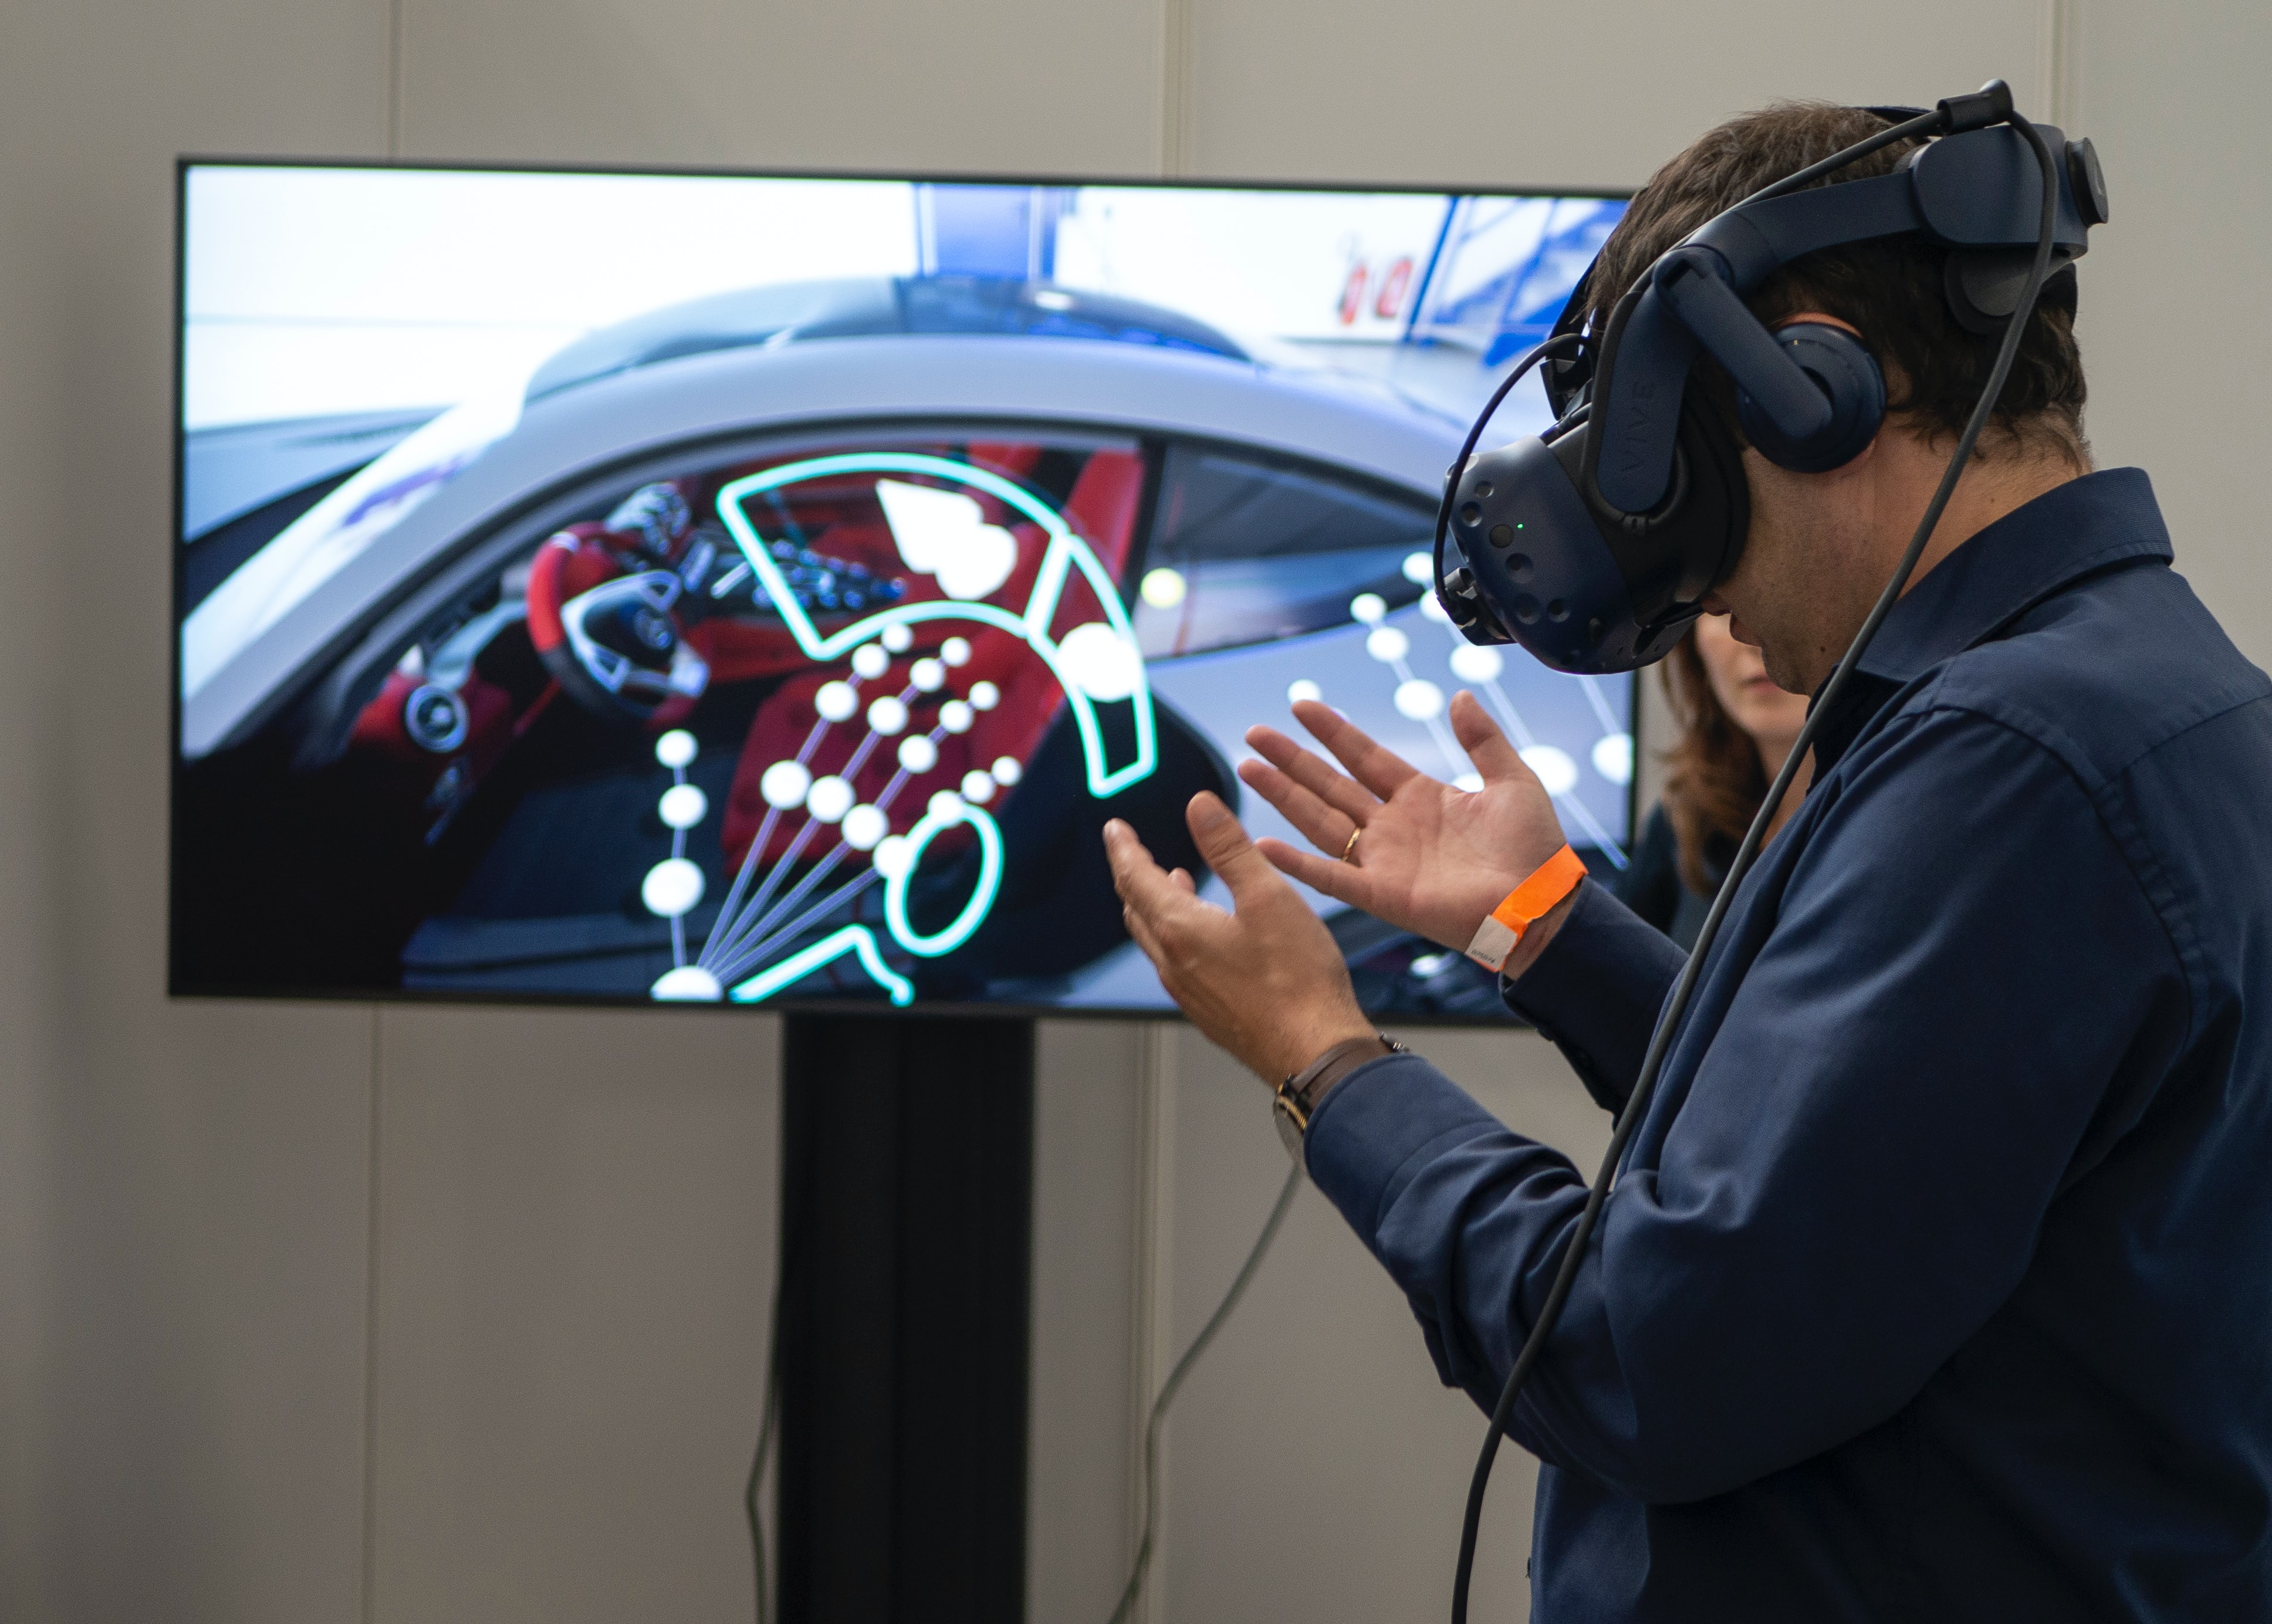 VR和AR技術的進步會對未來的商業模式產生深遠的影響。(Unsplash)